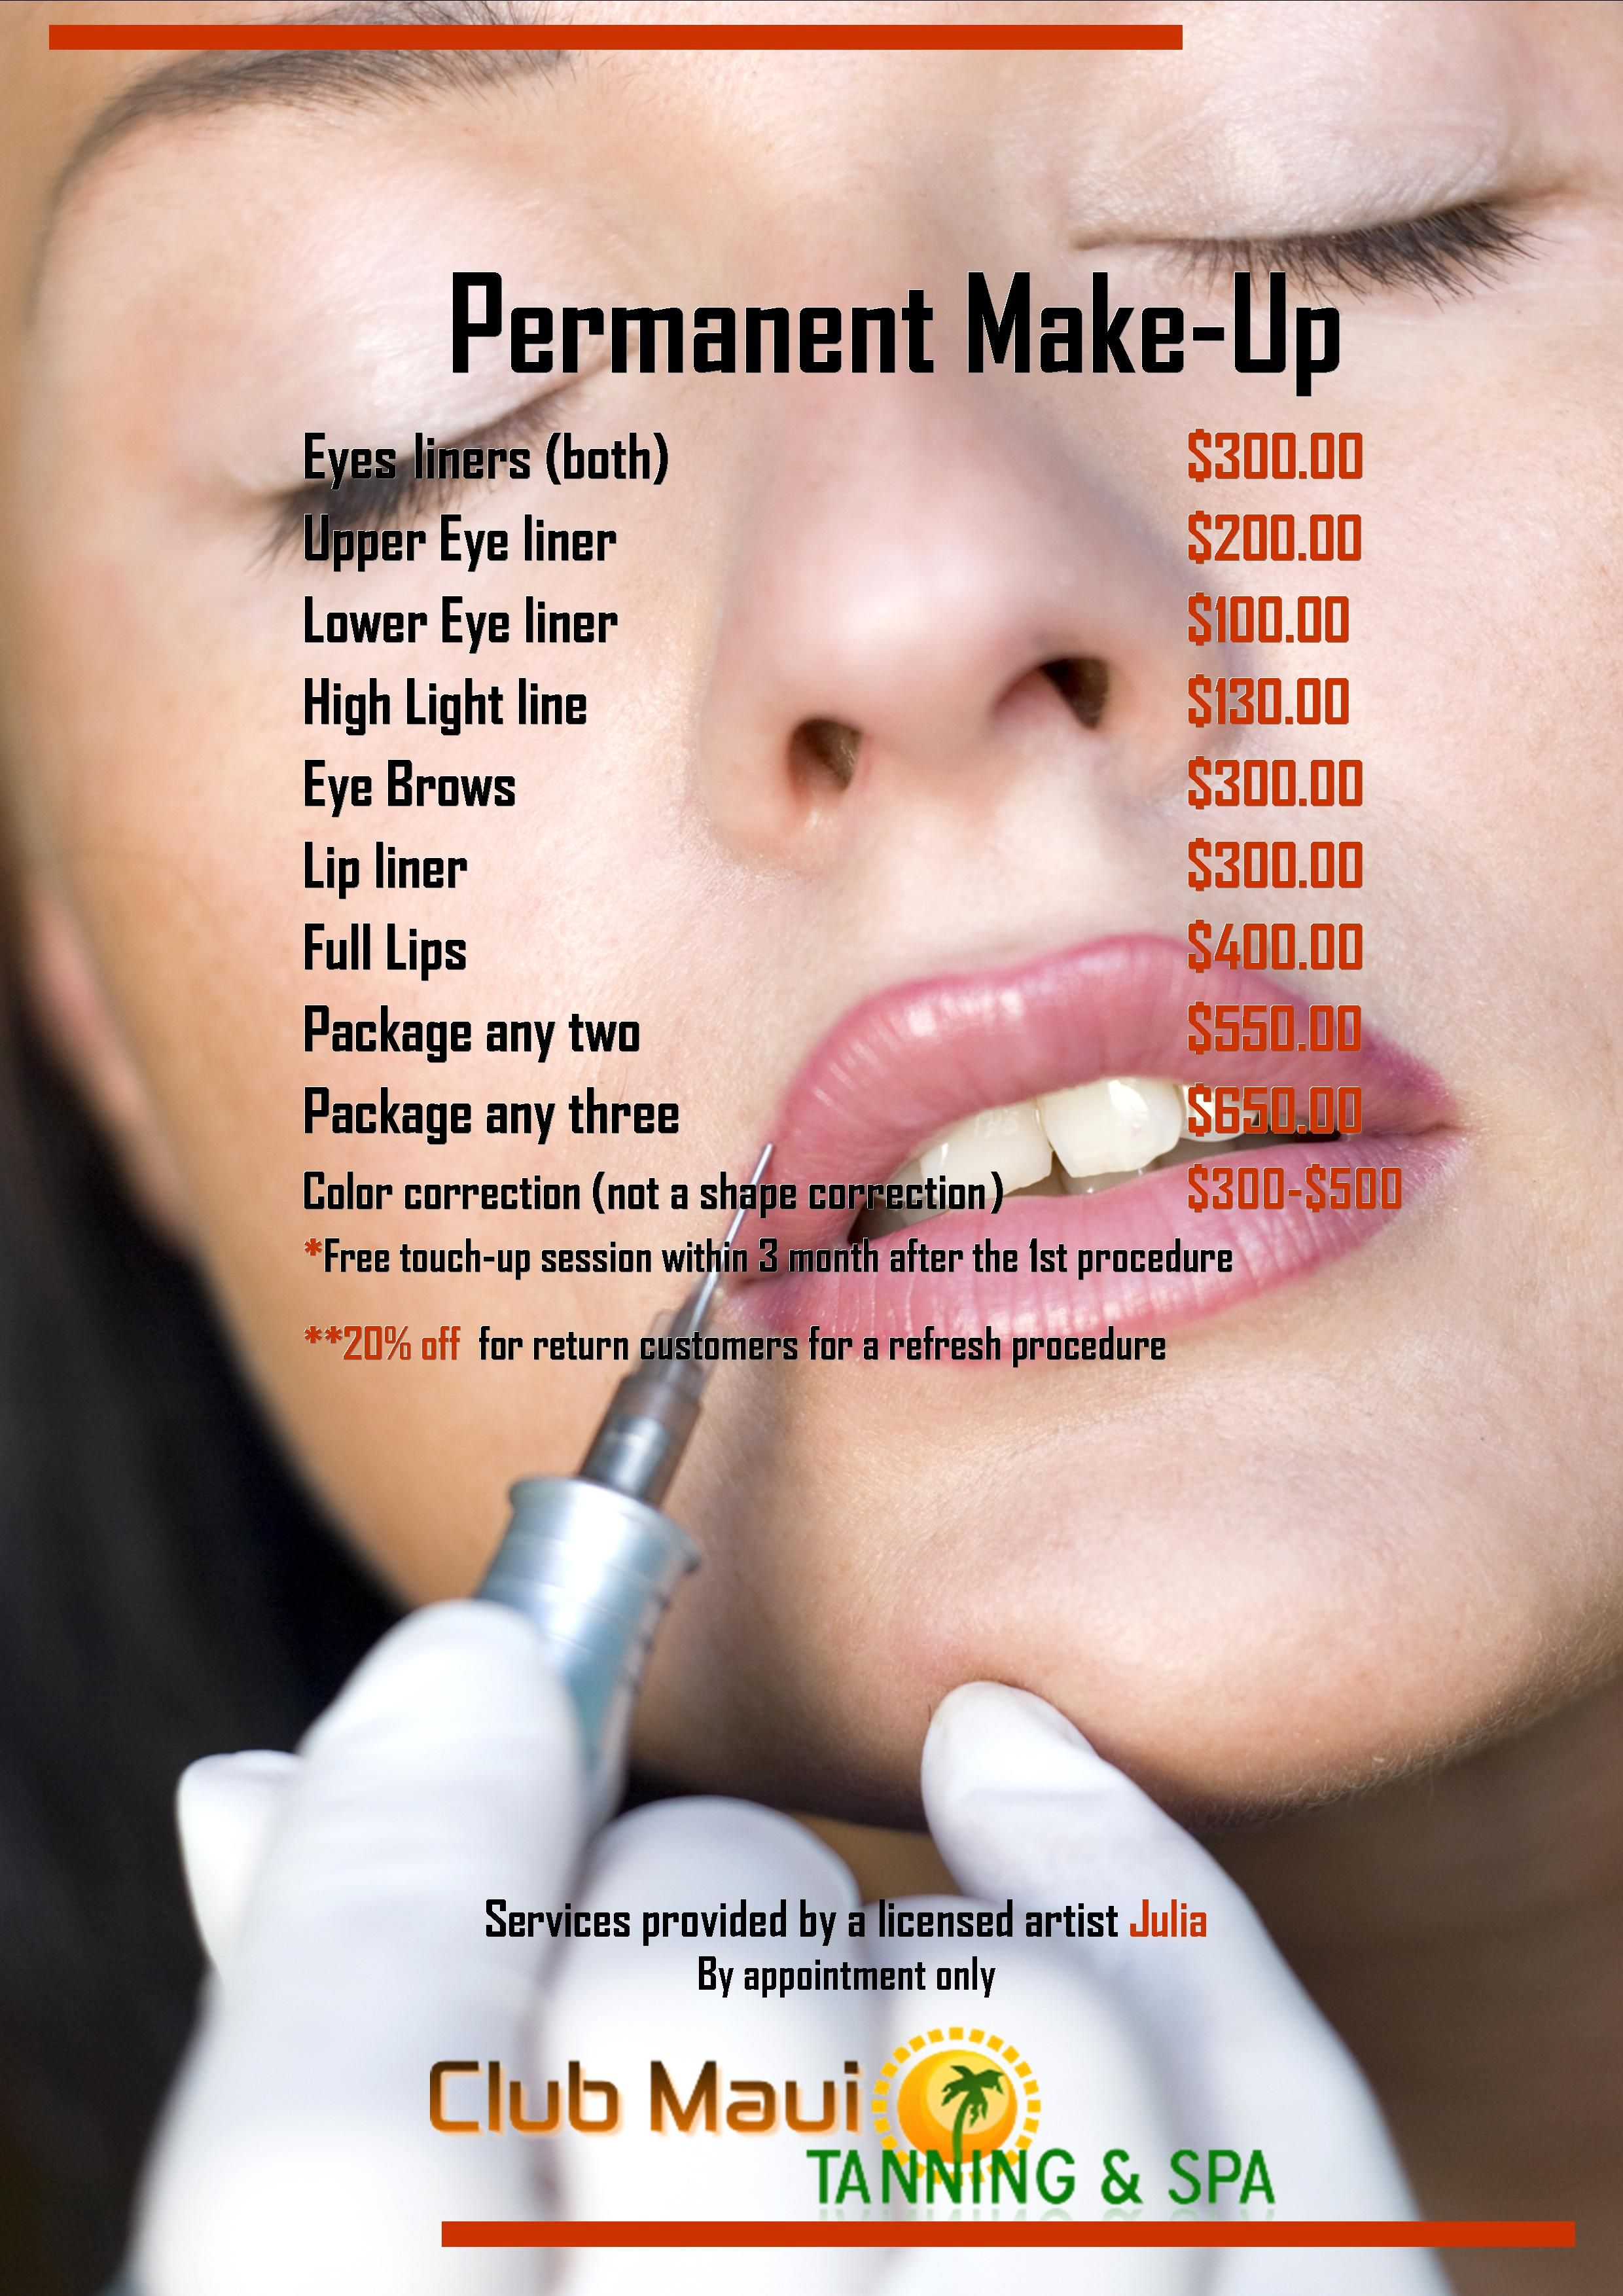 Club maui tanning spa permanent makeup price list